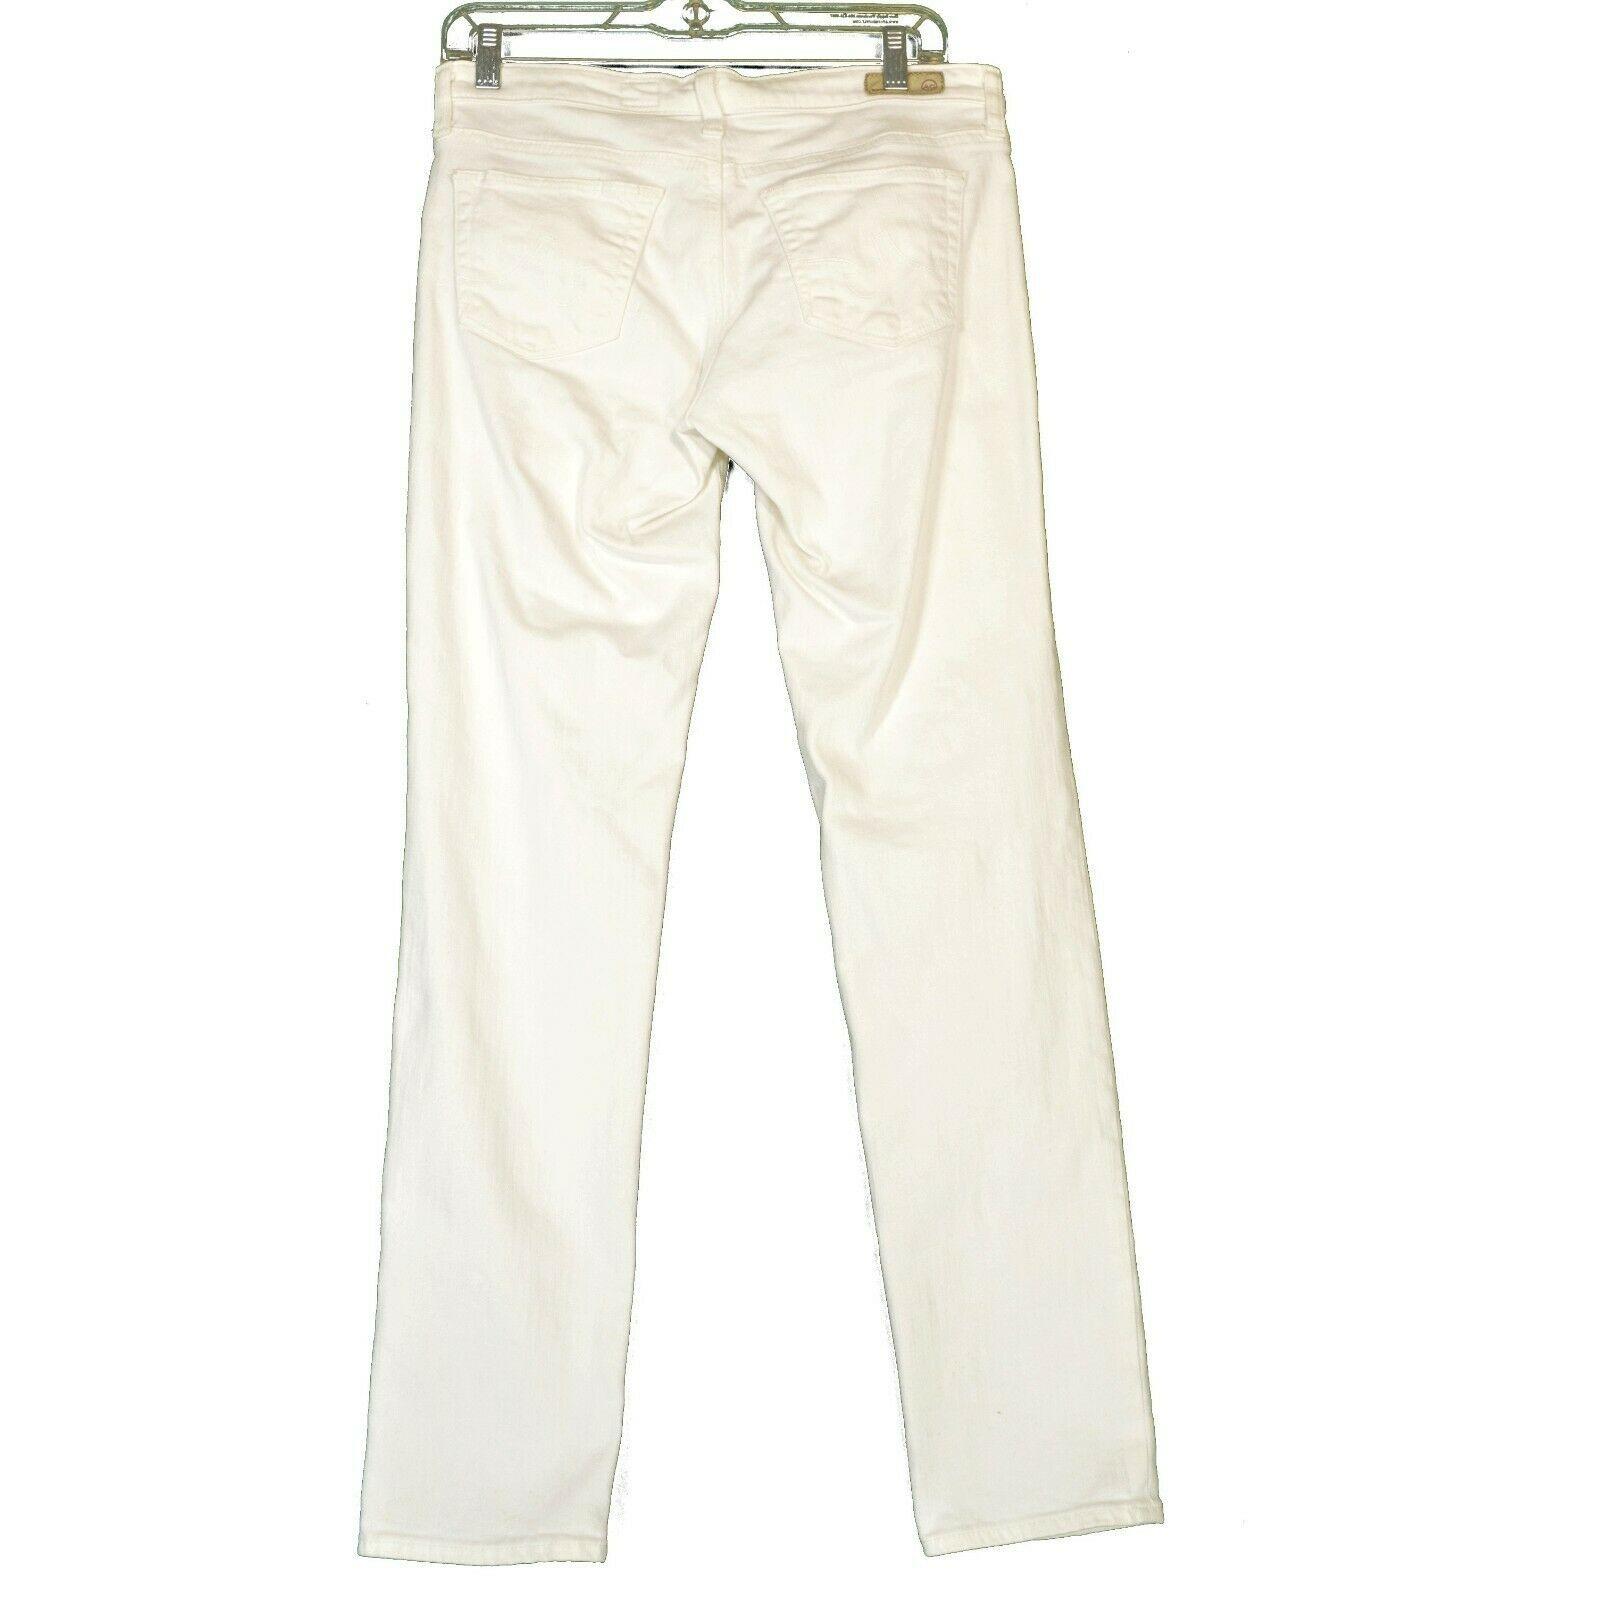 AG Adriano Goldschmied jeans 29 x 31 Stilt cigarette leg White thick EUCUSA image 7